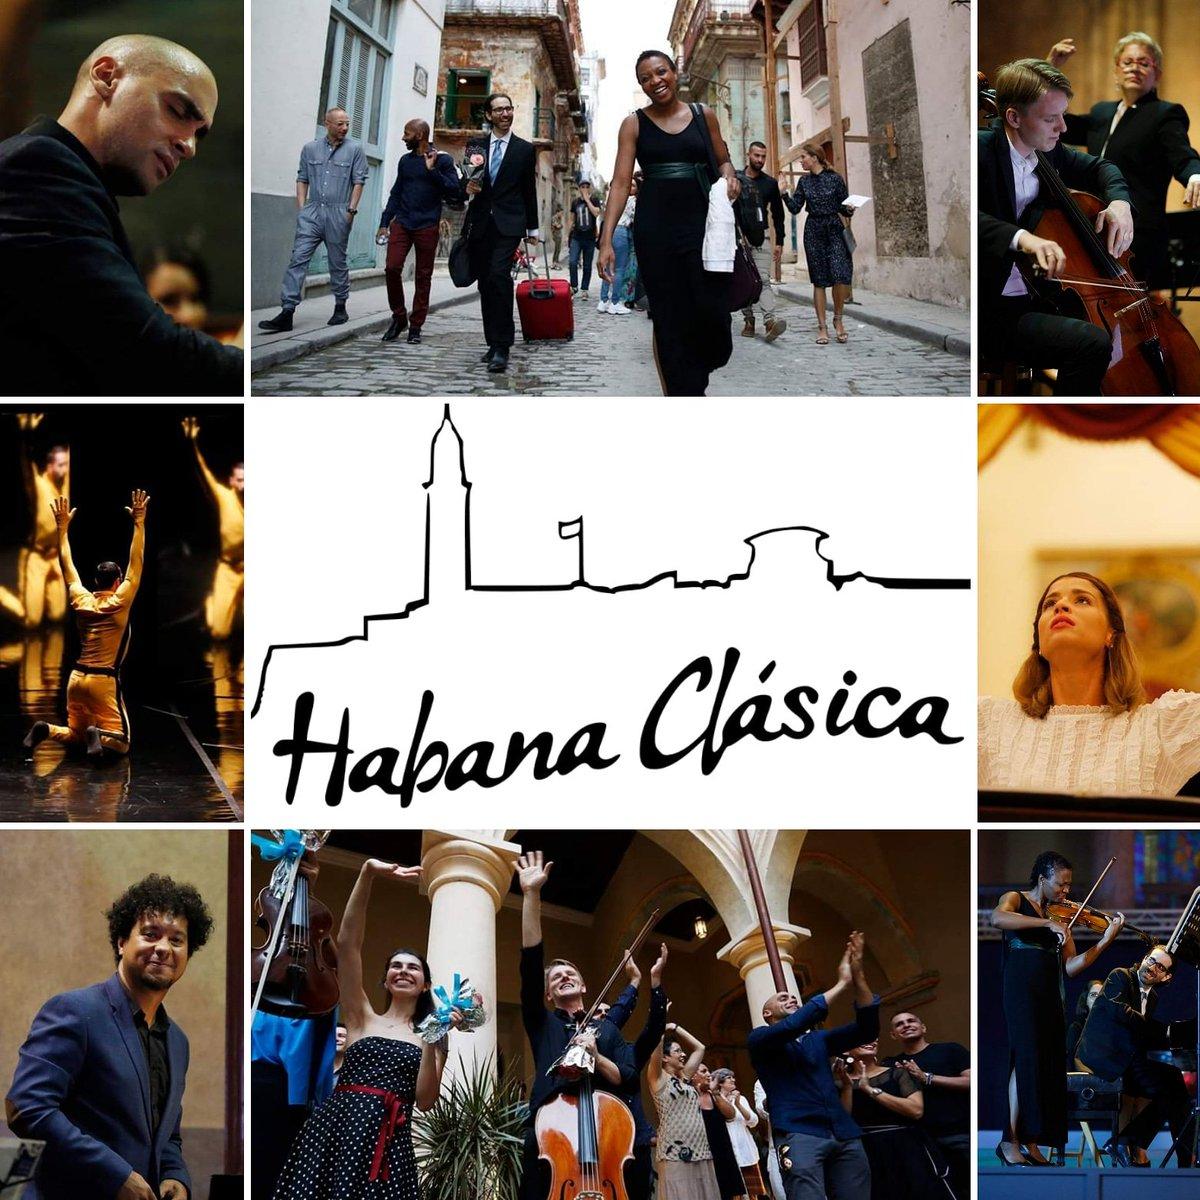 Habana clásica | Bildquelle: www.twitter.com © Twitter et al | Bilder sind in der Regel urheberrechtlich geschützt